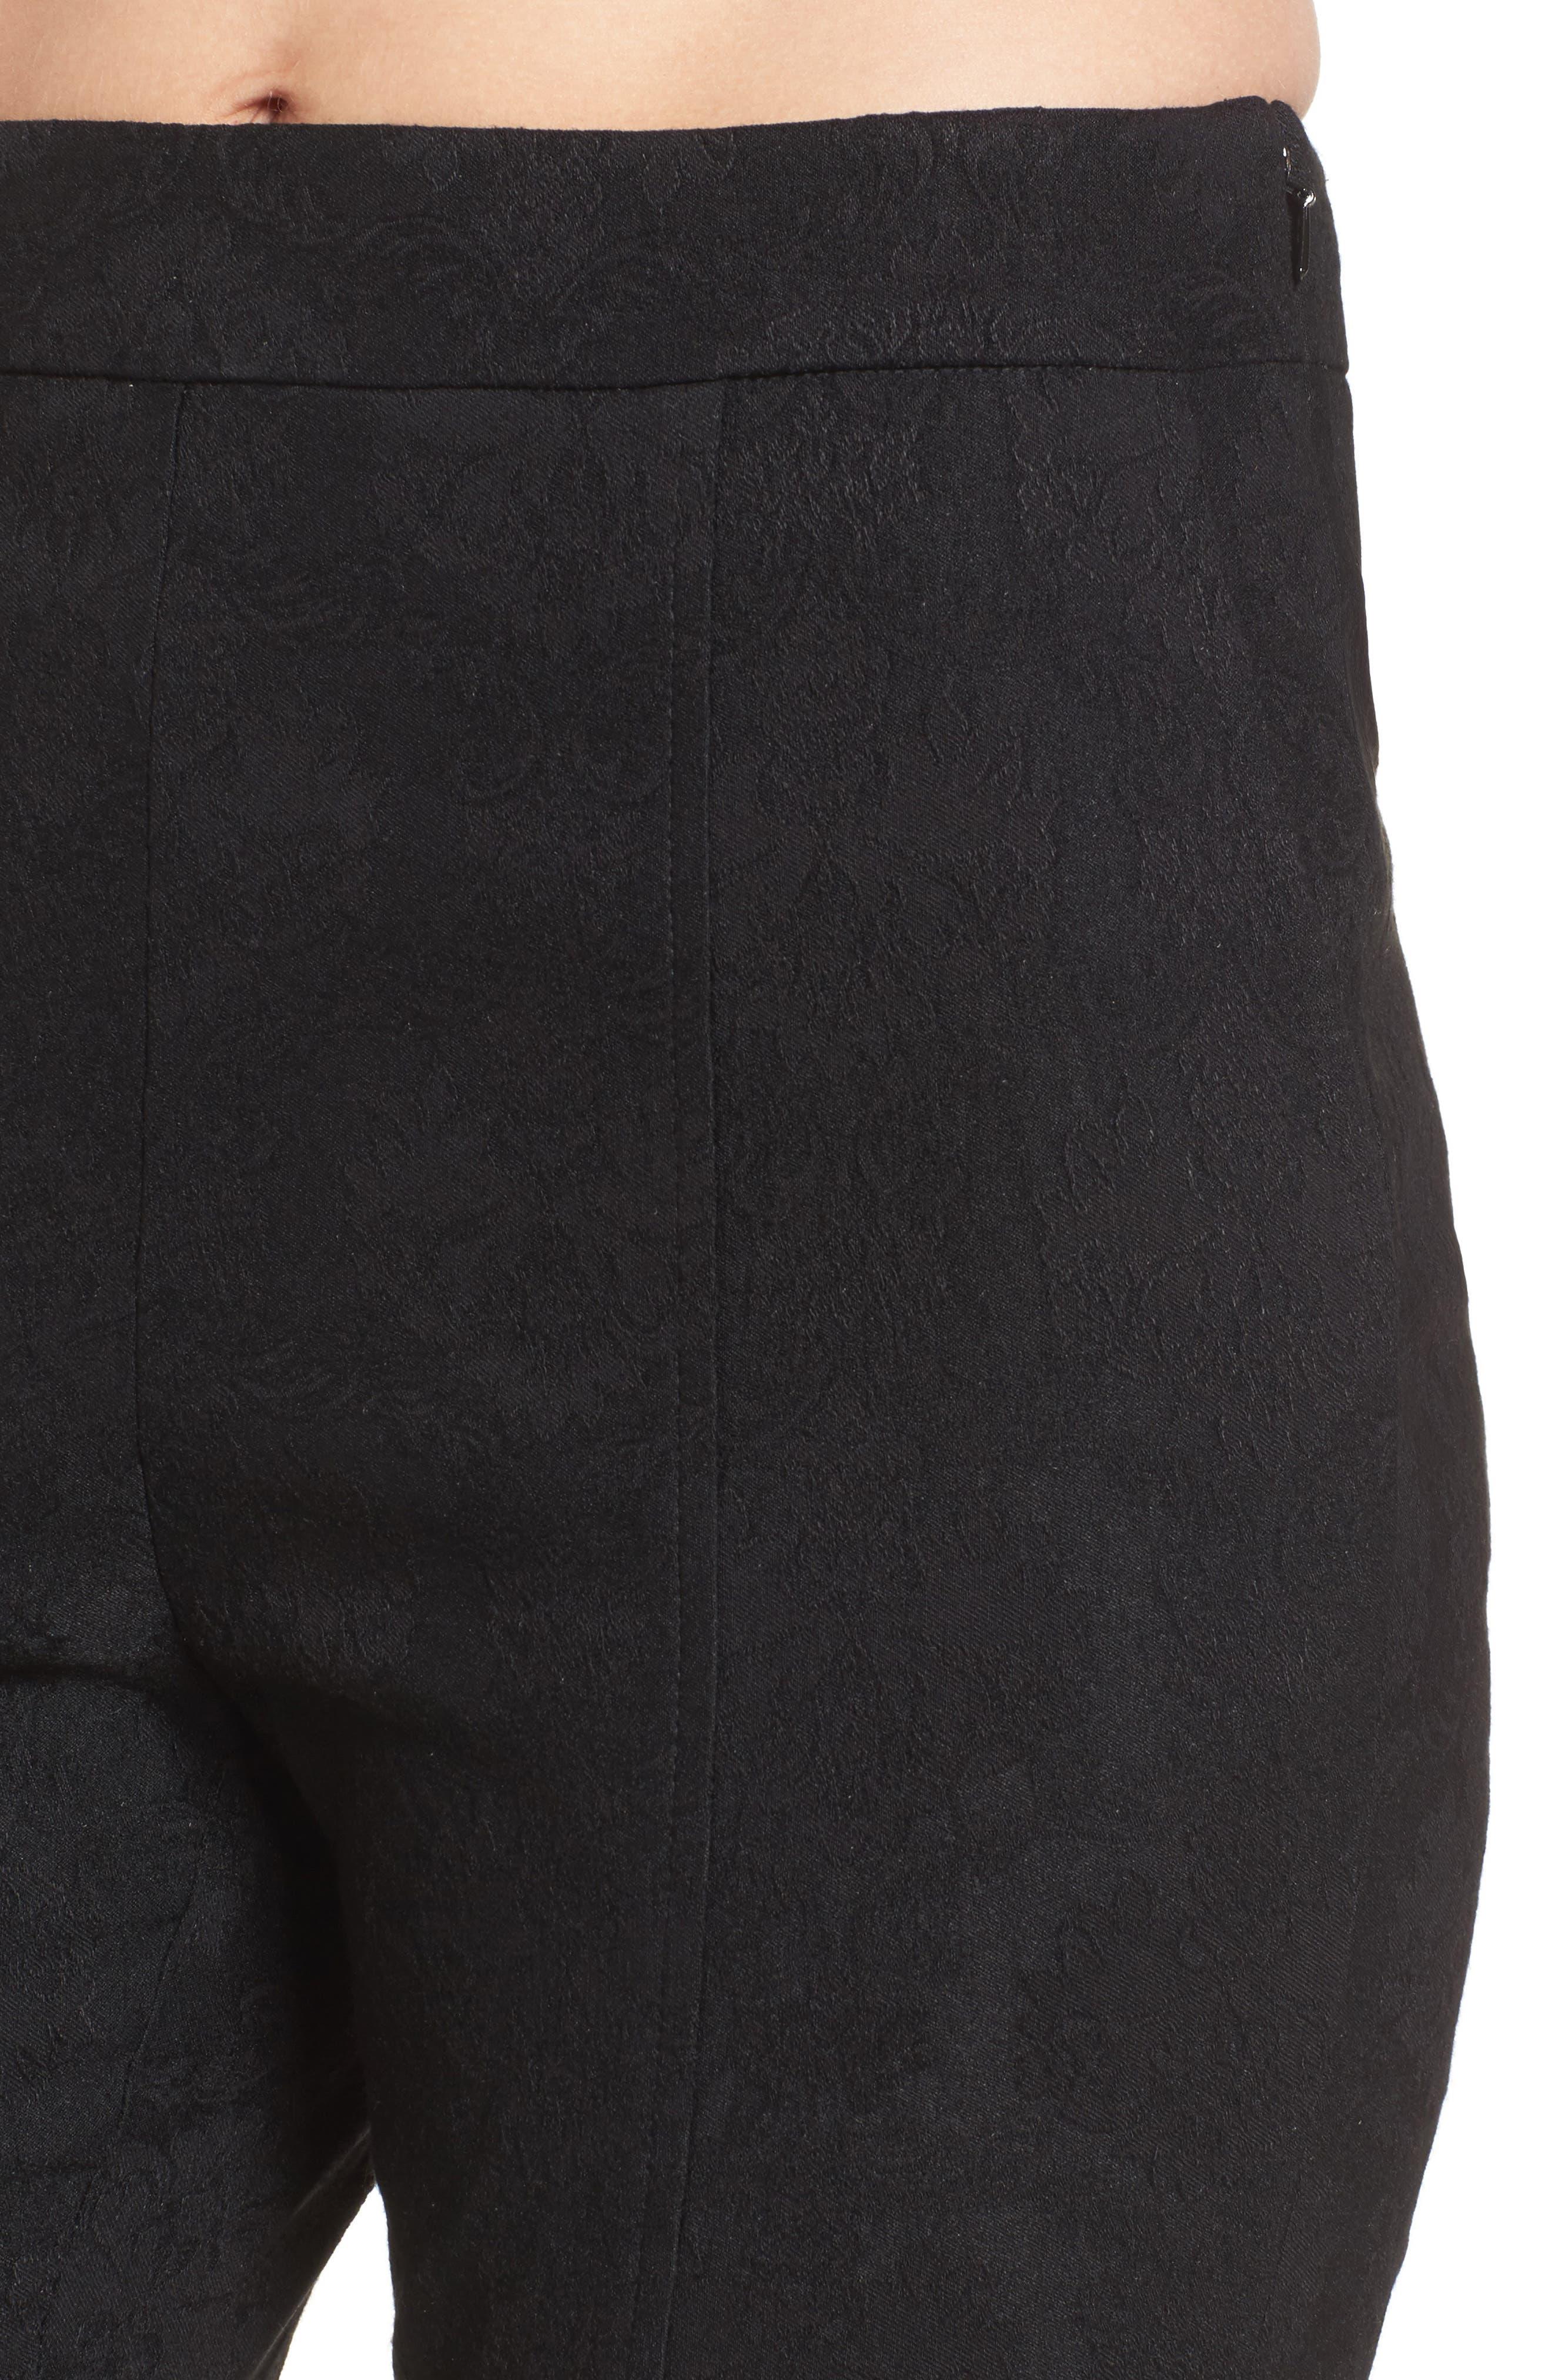 Leigh High Waist Crop Pants,                             Alternate thumbnail 5, color,                             Black